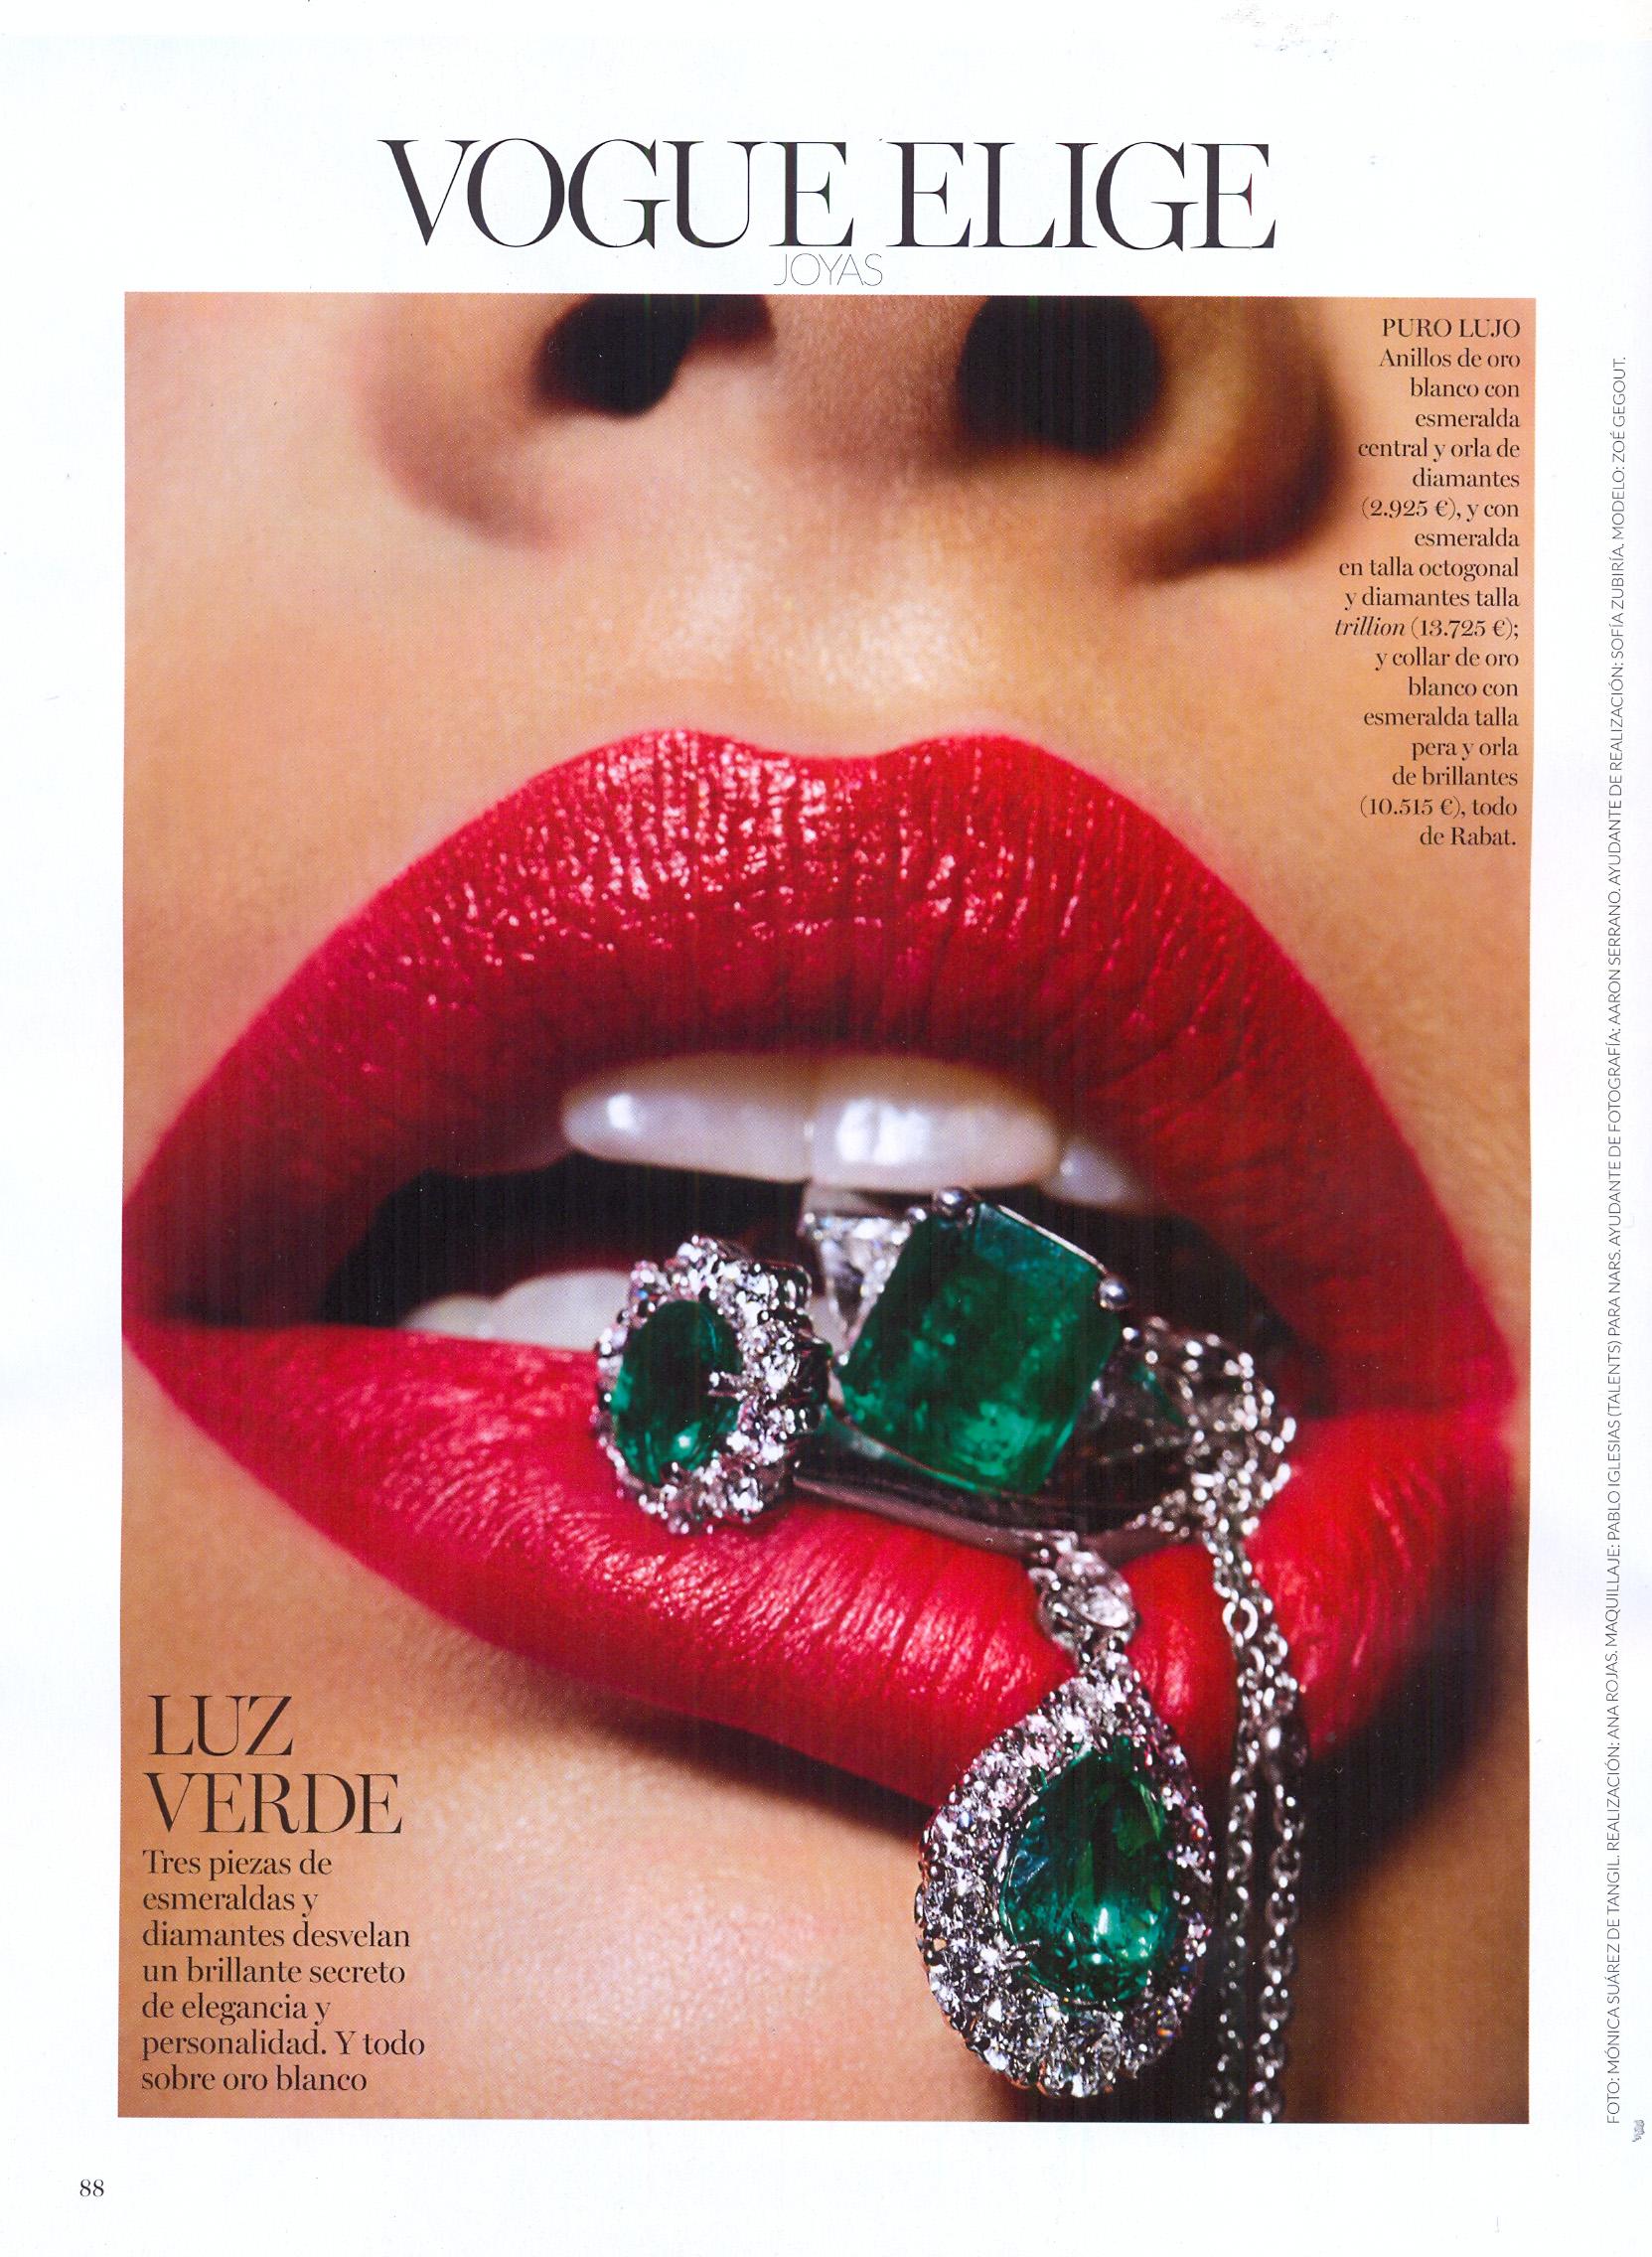 Vogue elige home – Pablo